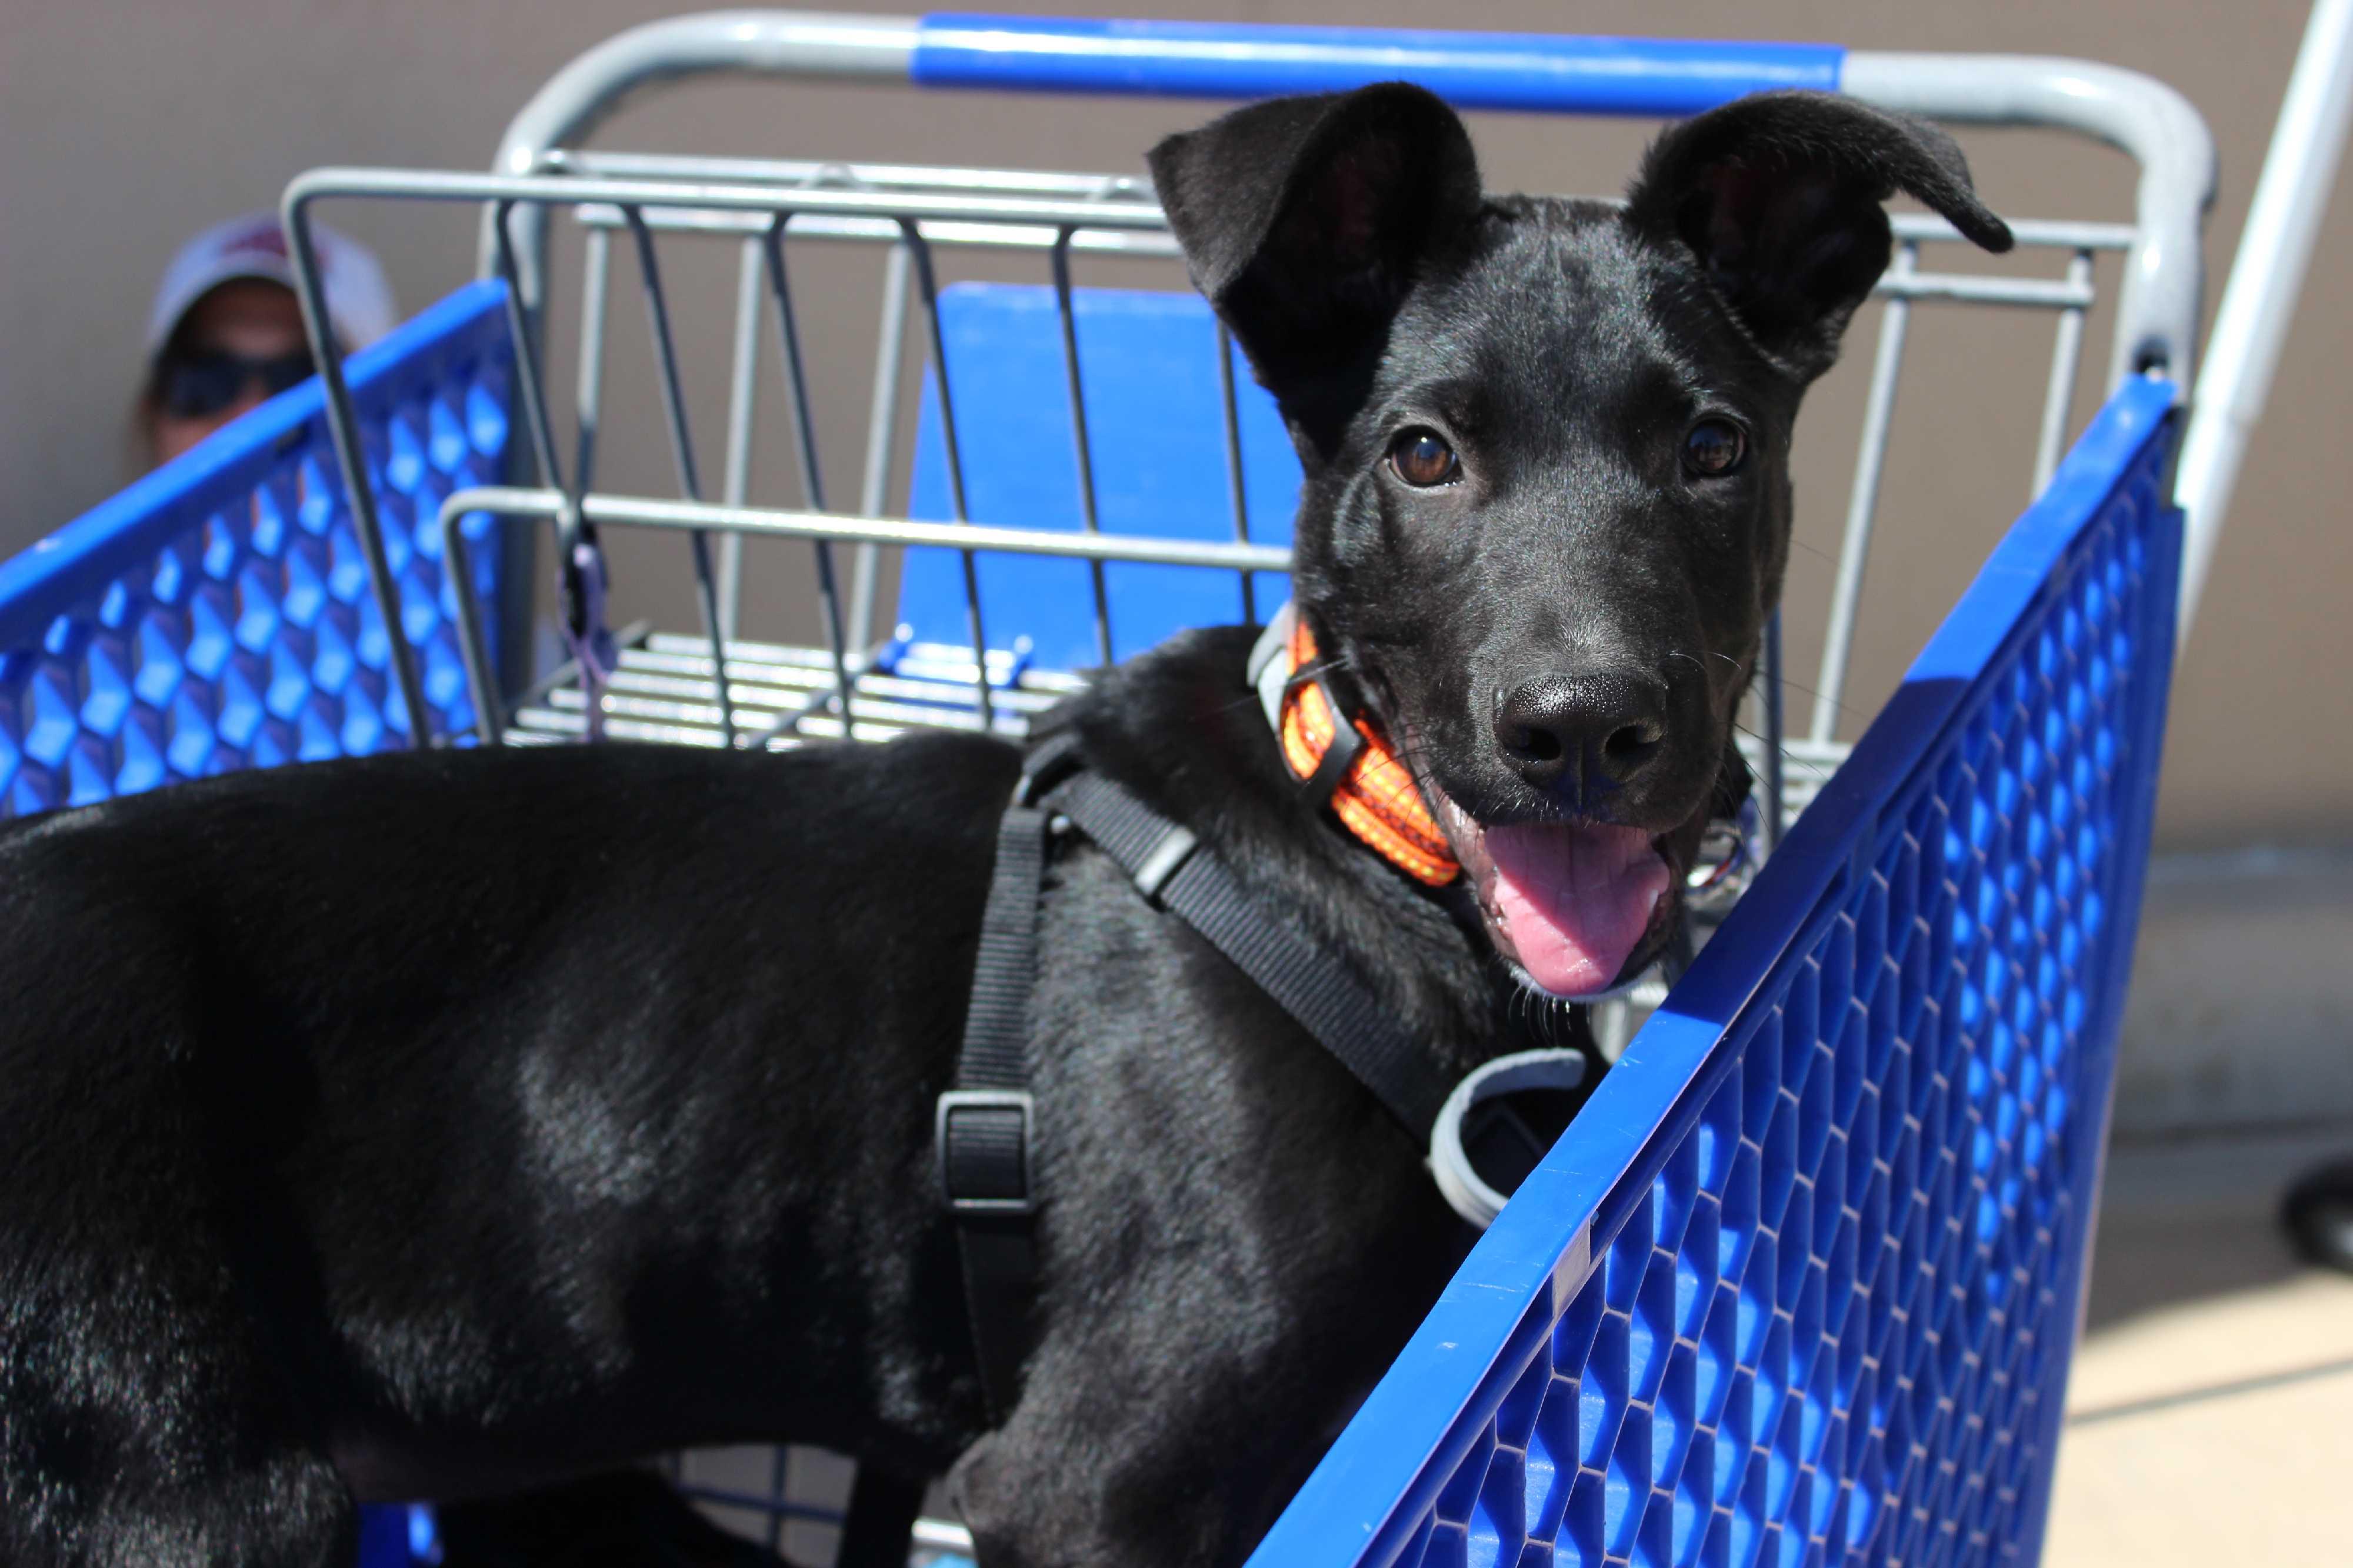 wichita falls, tx great dane meet draco a pet for adoptionmy name is draco!